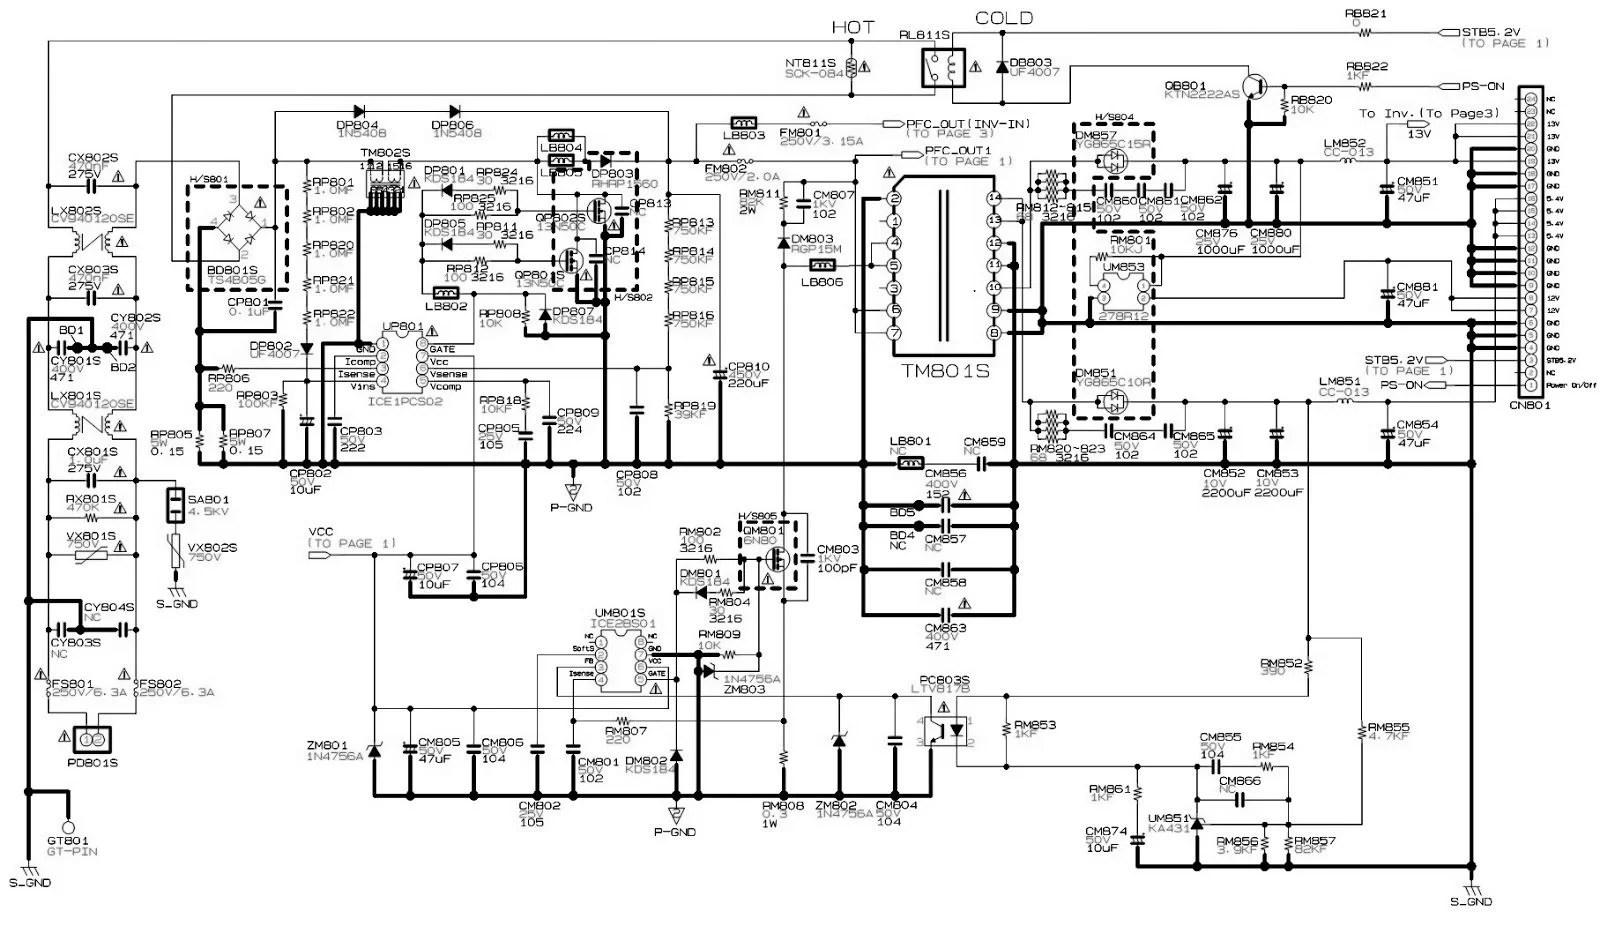 lcd light wiring diagram wiring diagram article  lcd light wiring diagram #5